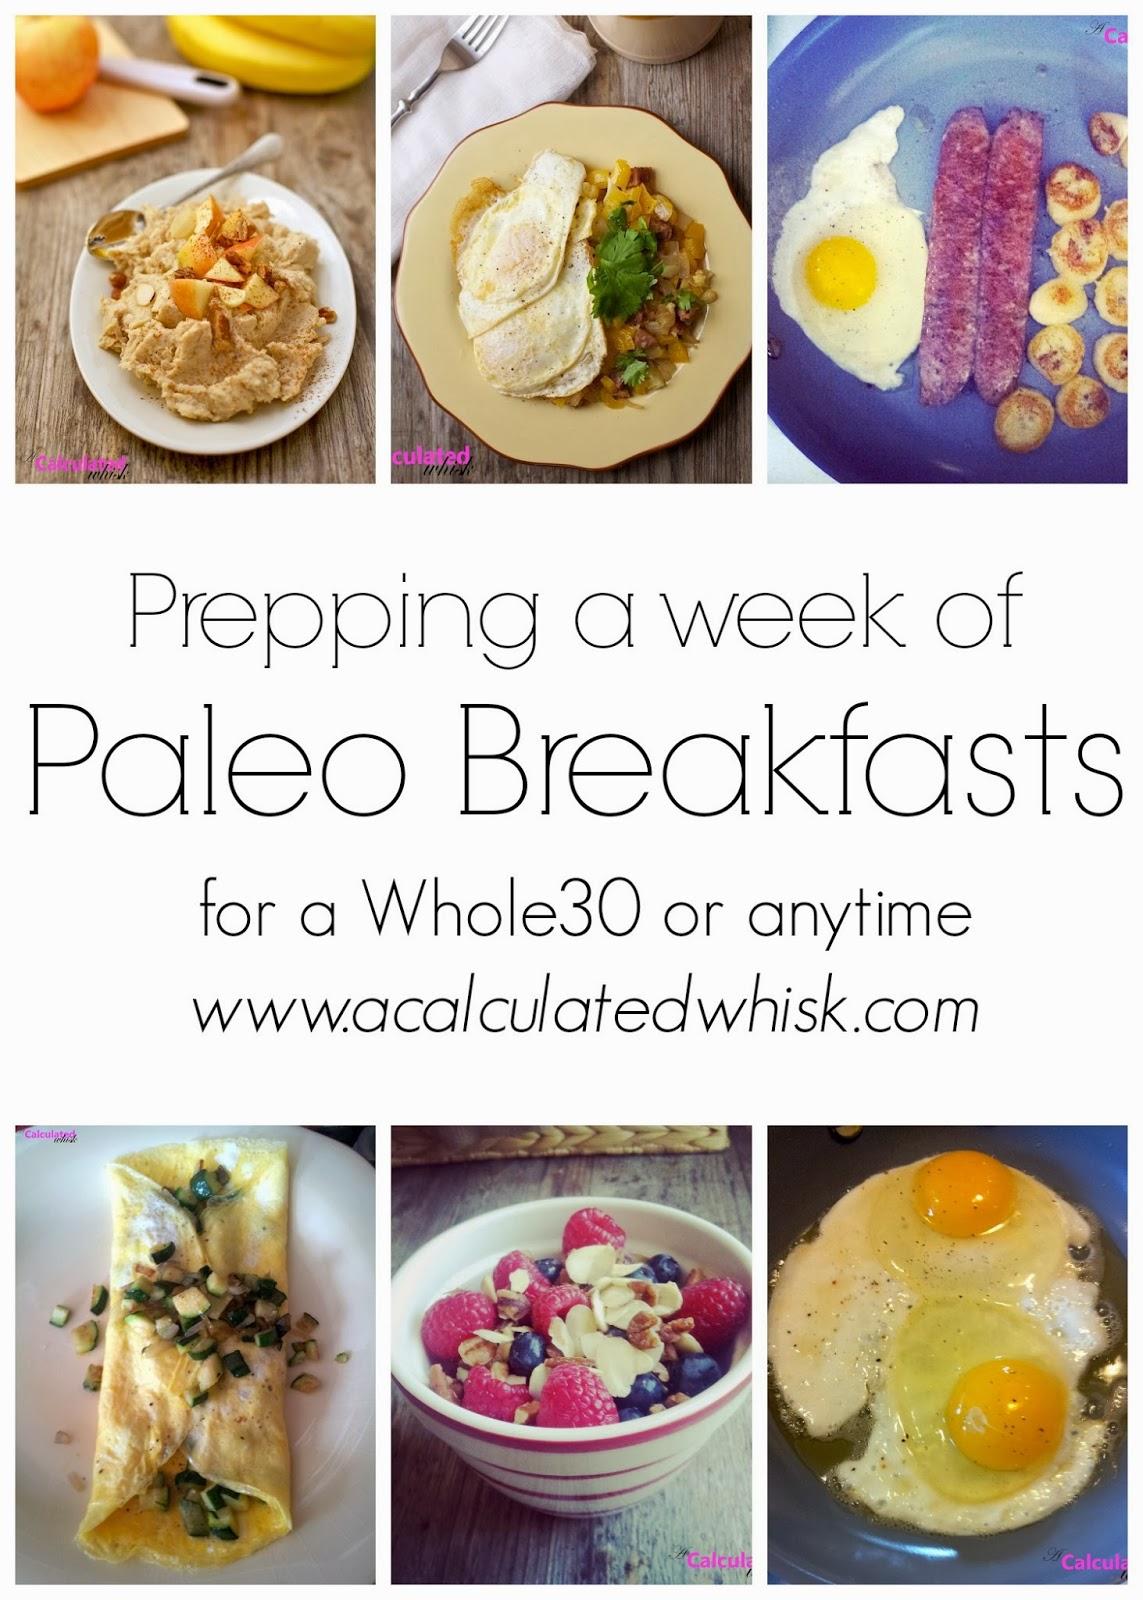 Preparando una semana de desayunos paleo   acalculatedwhisk.com